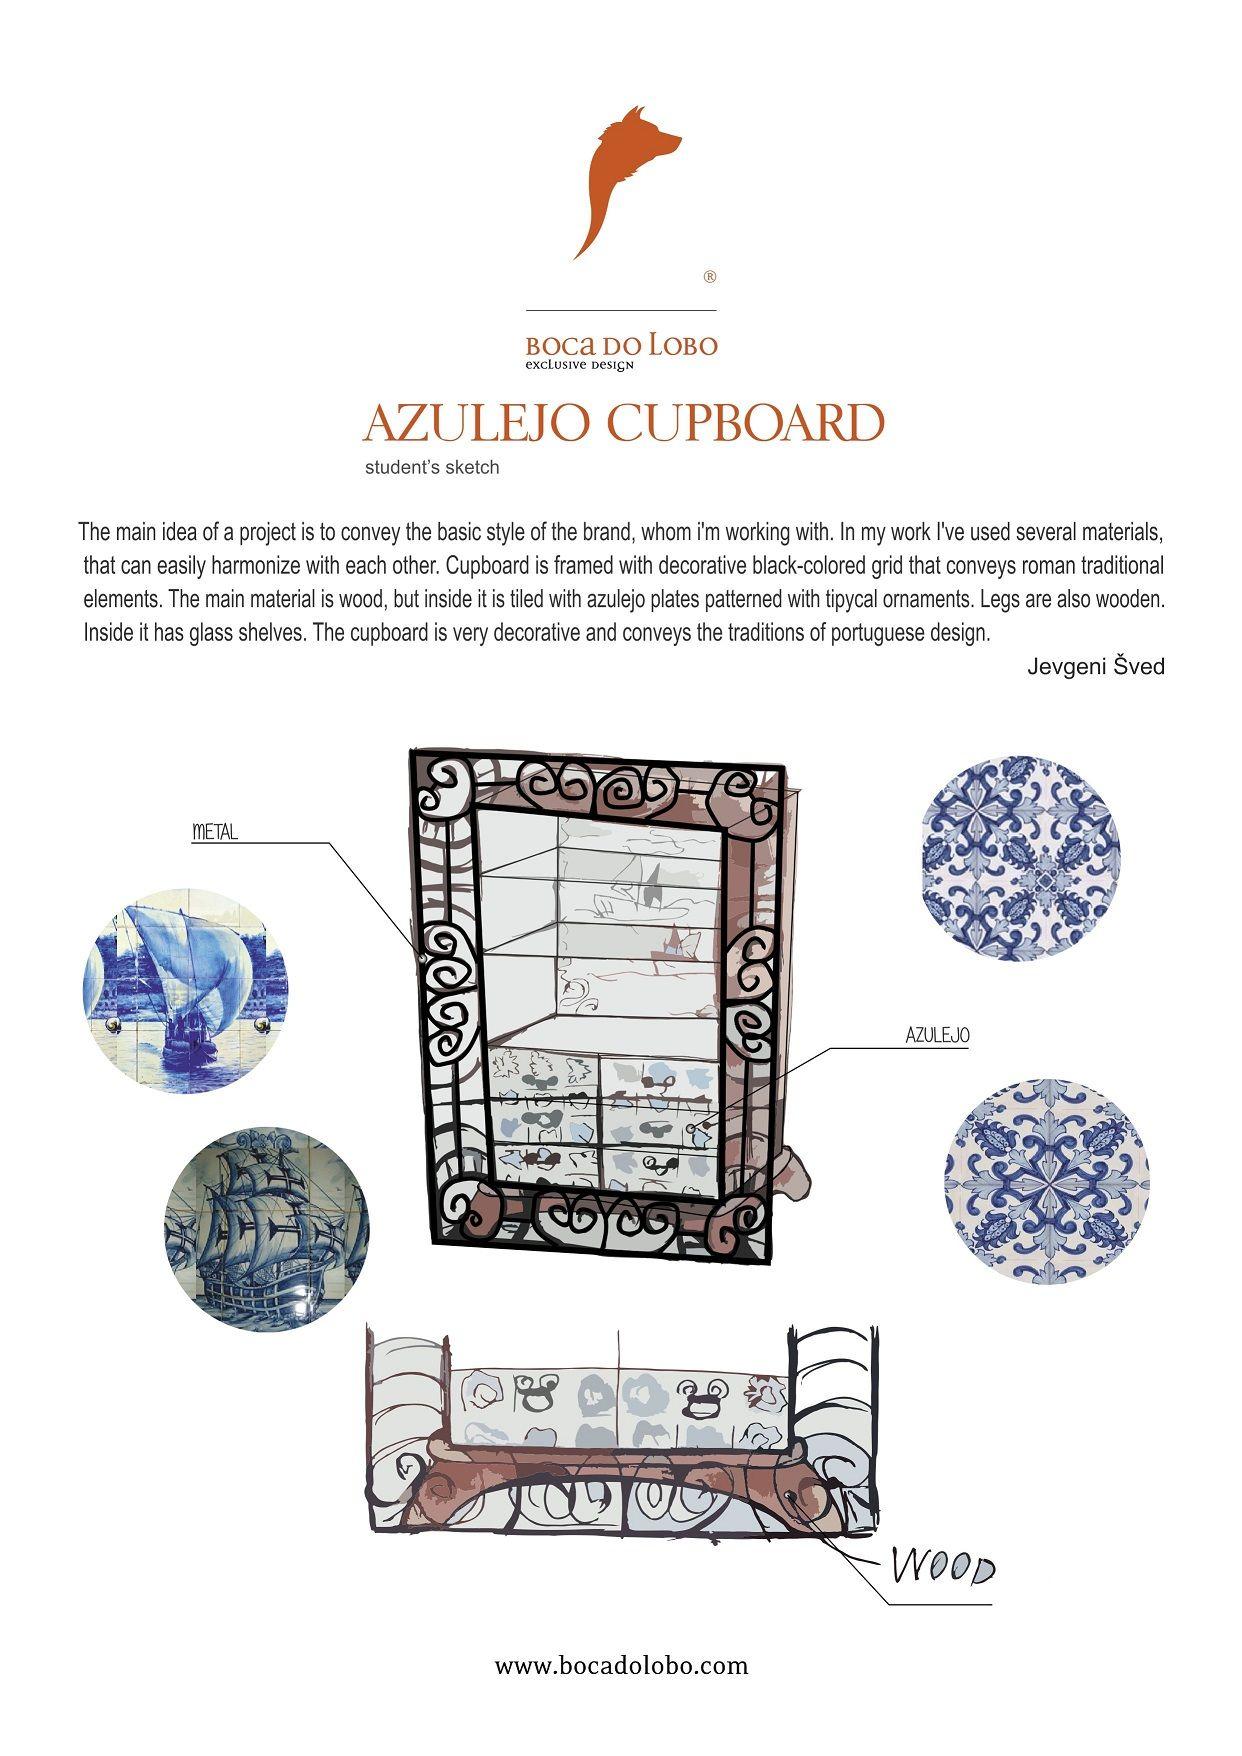 #IDEA #3, #JevgeniSvedBOCADOLOBO,   Third idea:  AZULEJO CUPBOARD